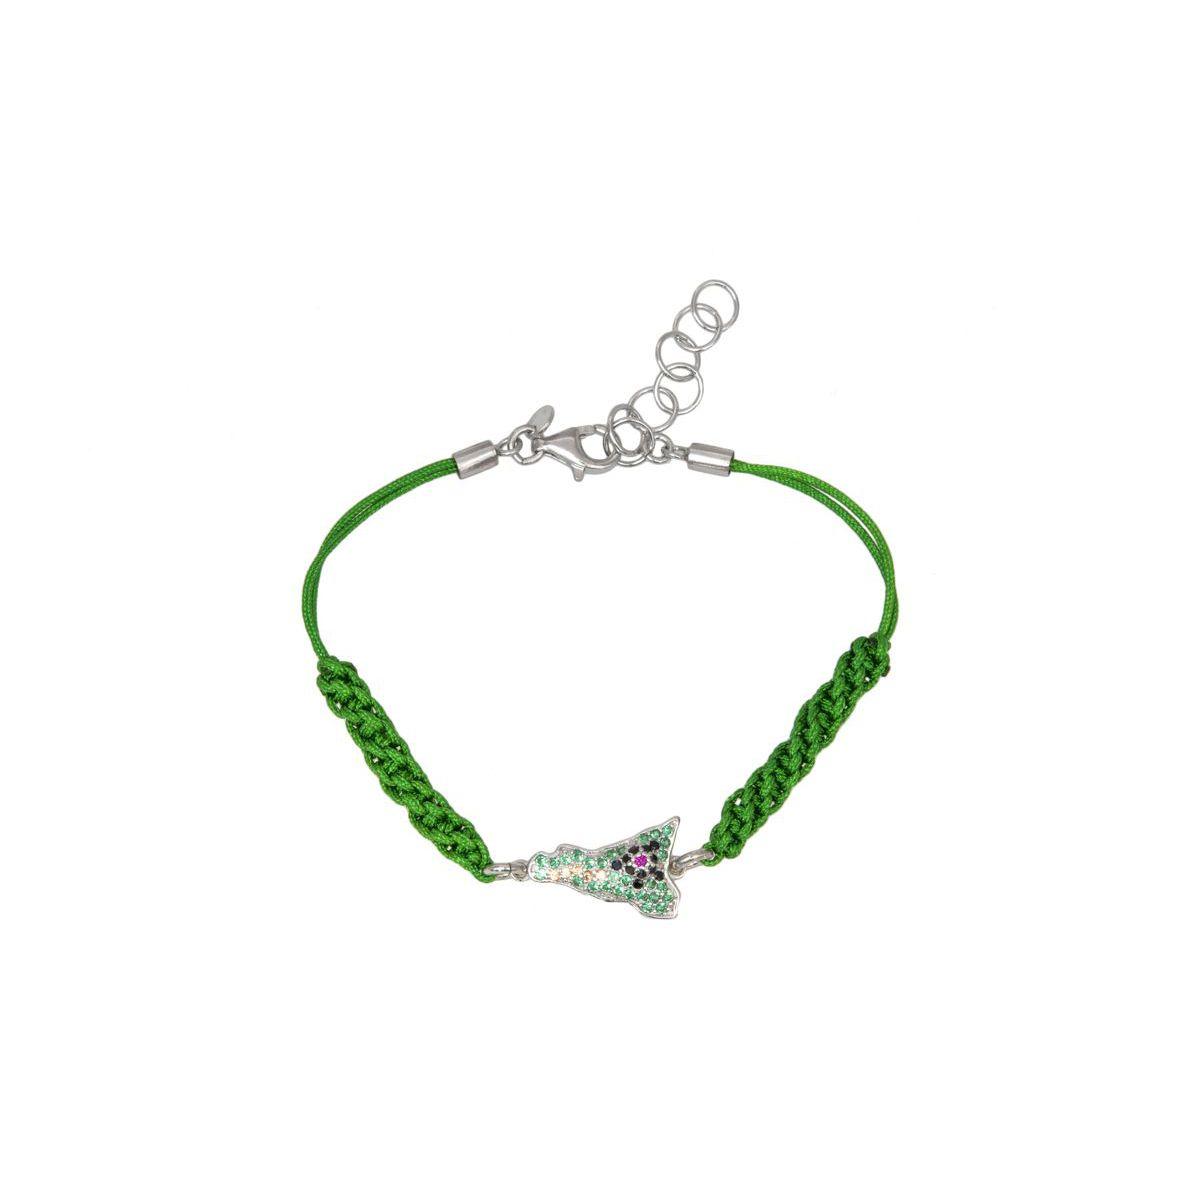 MACRAME B SICILY BRACELET Z Green M'AMI SICILY JEWELS